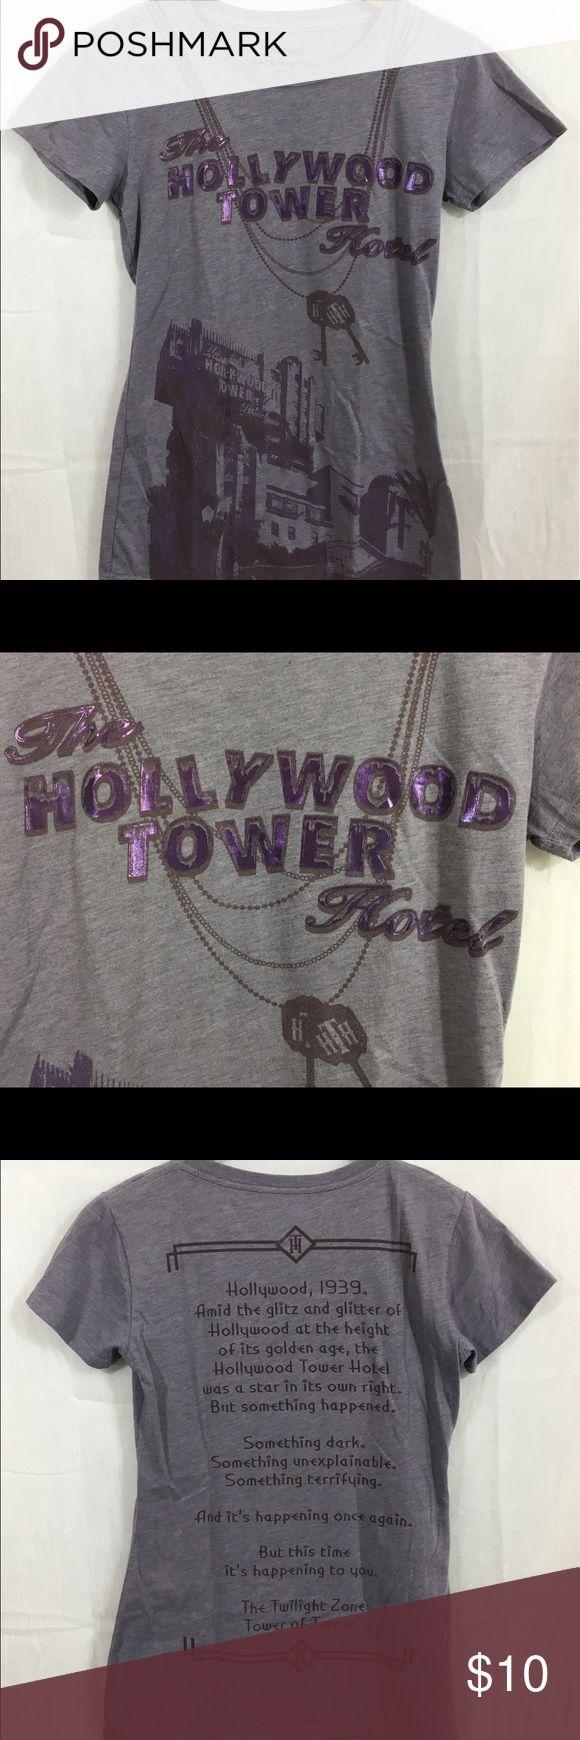 Ladies XS Disneyland Hollywood Hotel BurnOut T Licensed  Disneyland Resort Purple BurnOut T-shirt  in a ladies XS. Will bundle w/ 15% off 2 or more items! Disney Tops Tees - Short Sleeve